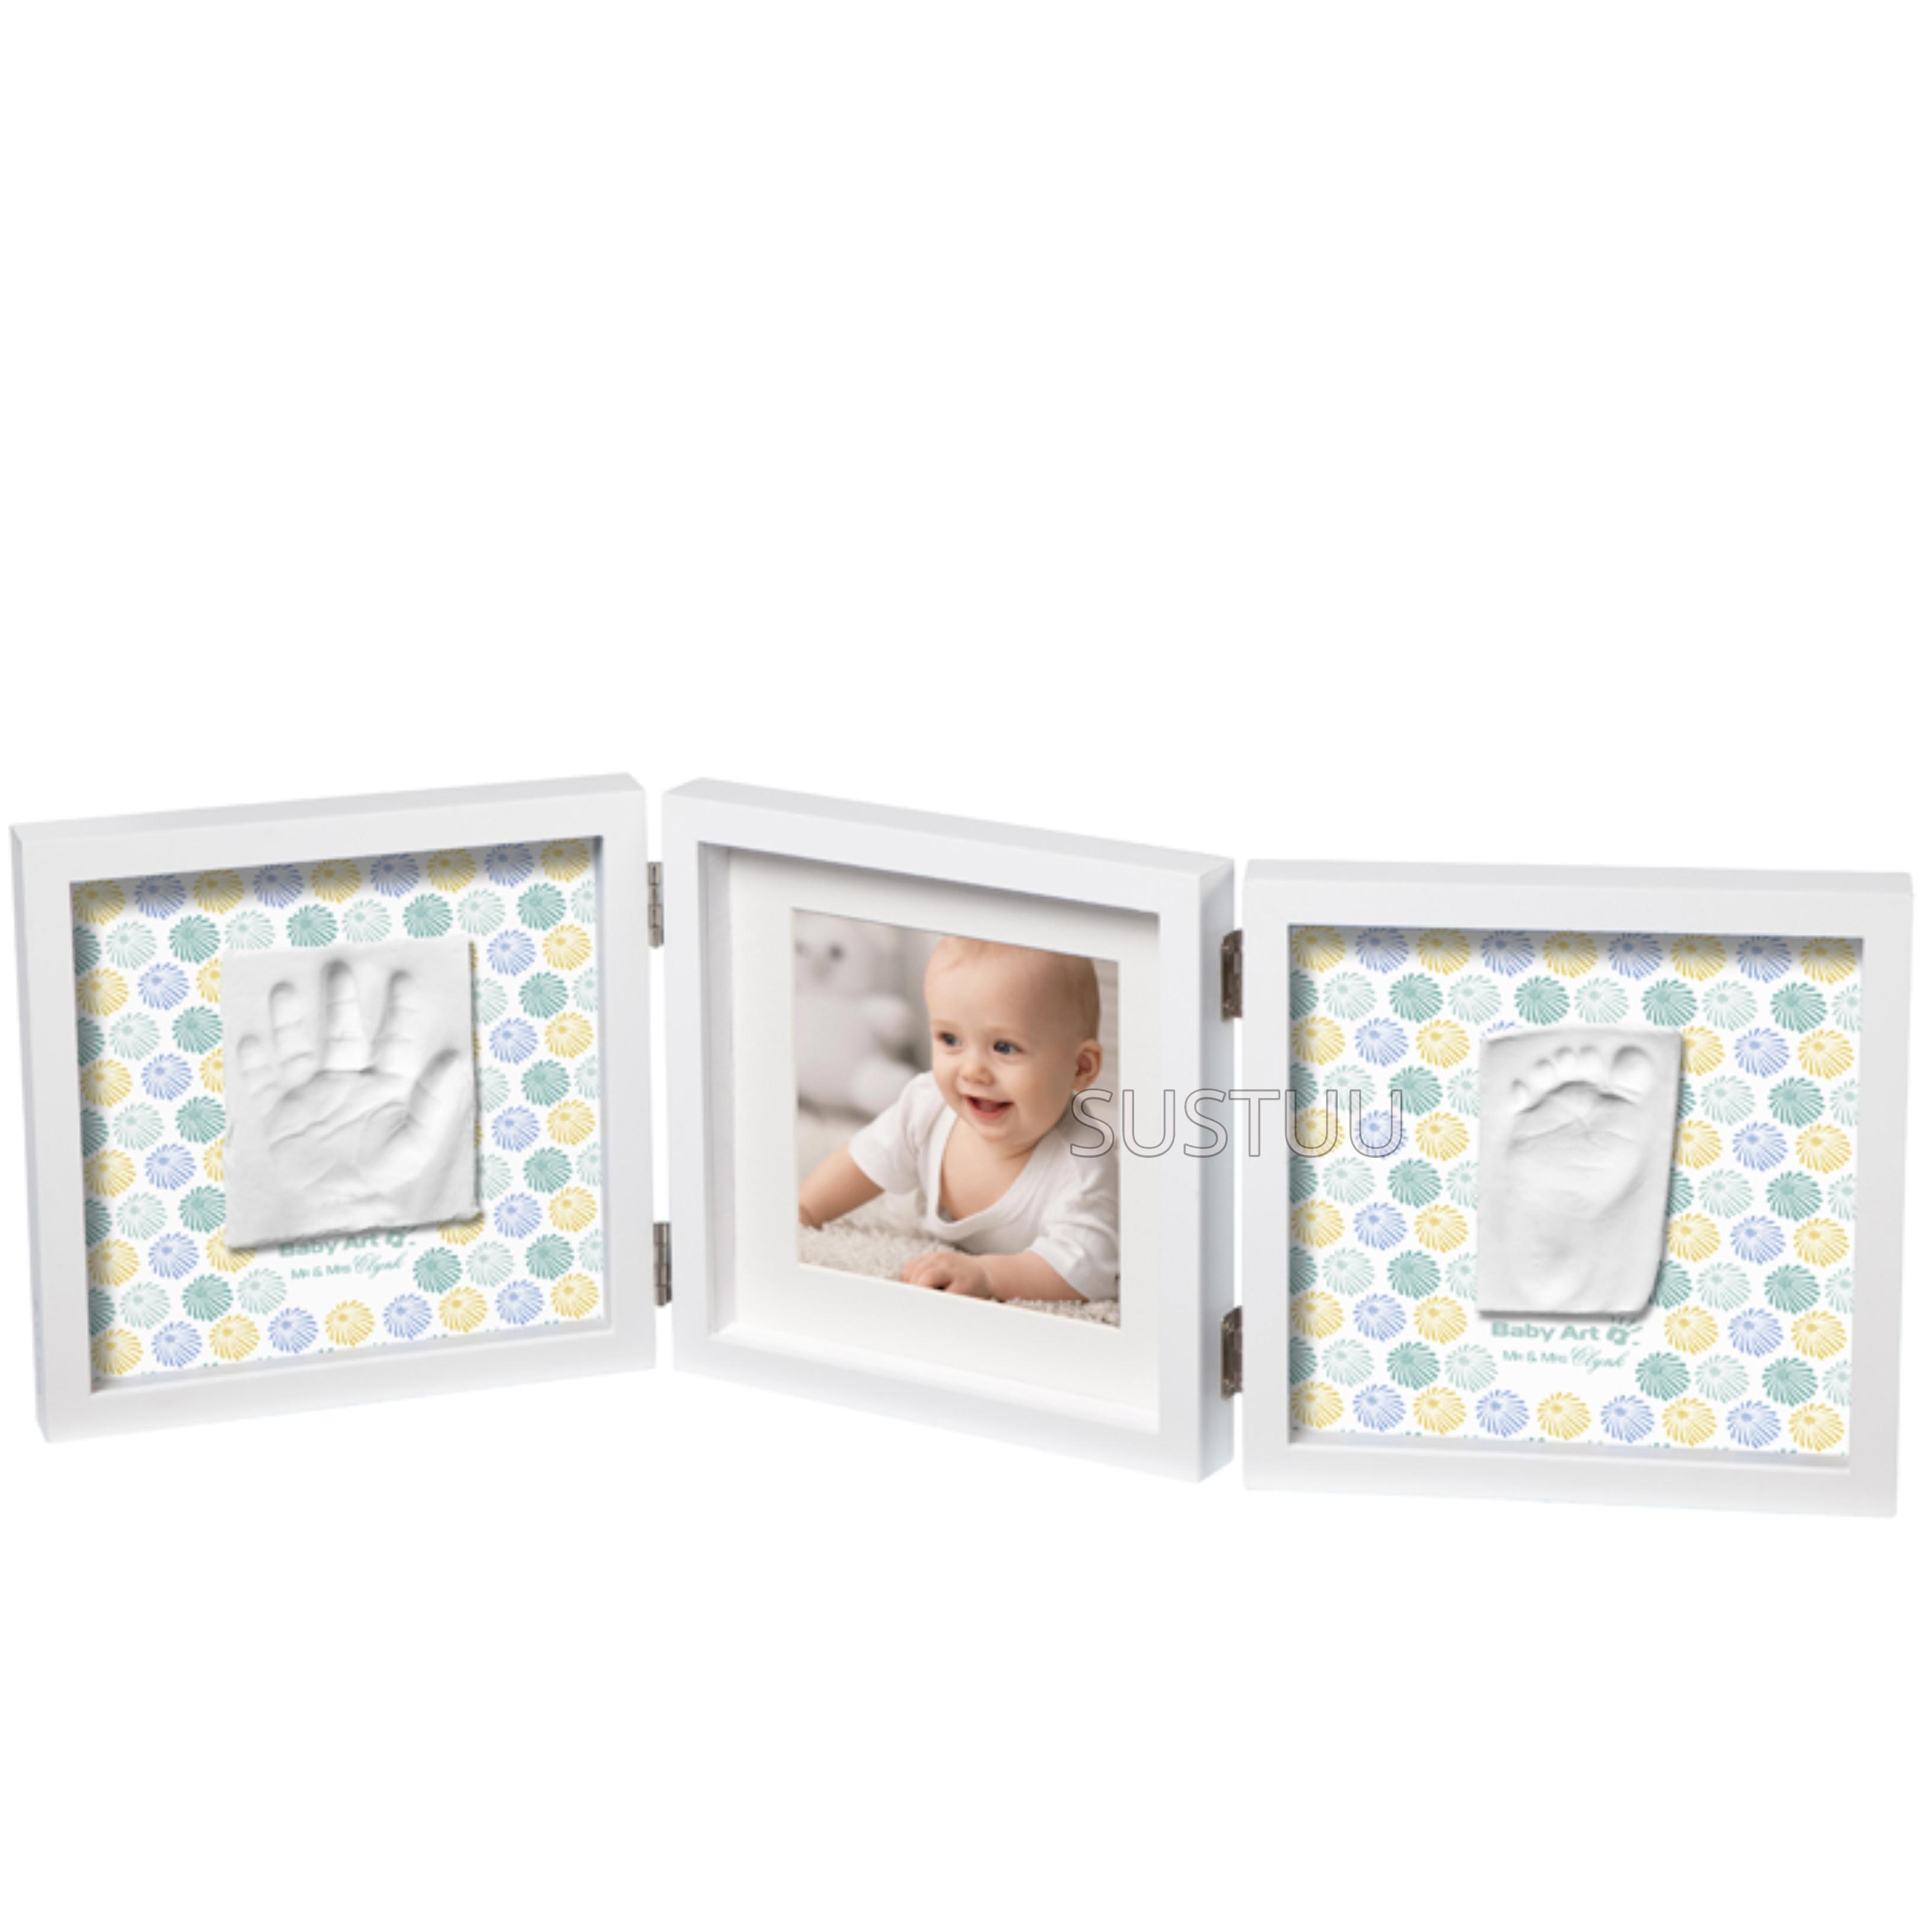 Baby Art My Baby Style Double Print Frame Mr & Mrs Clynk | Giftware For Babyshower, Birthdays & Christening